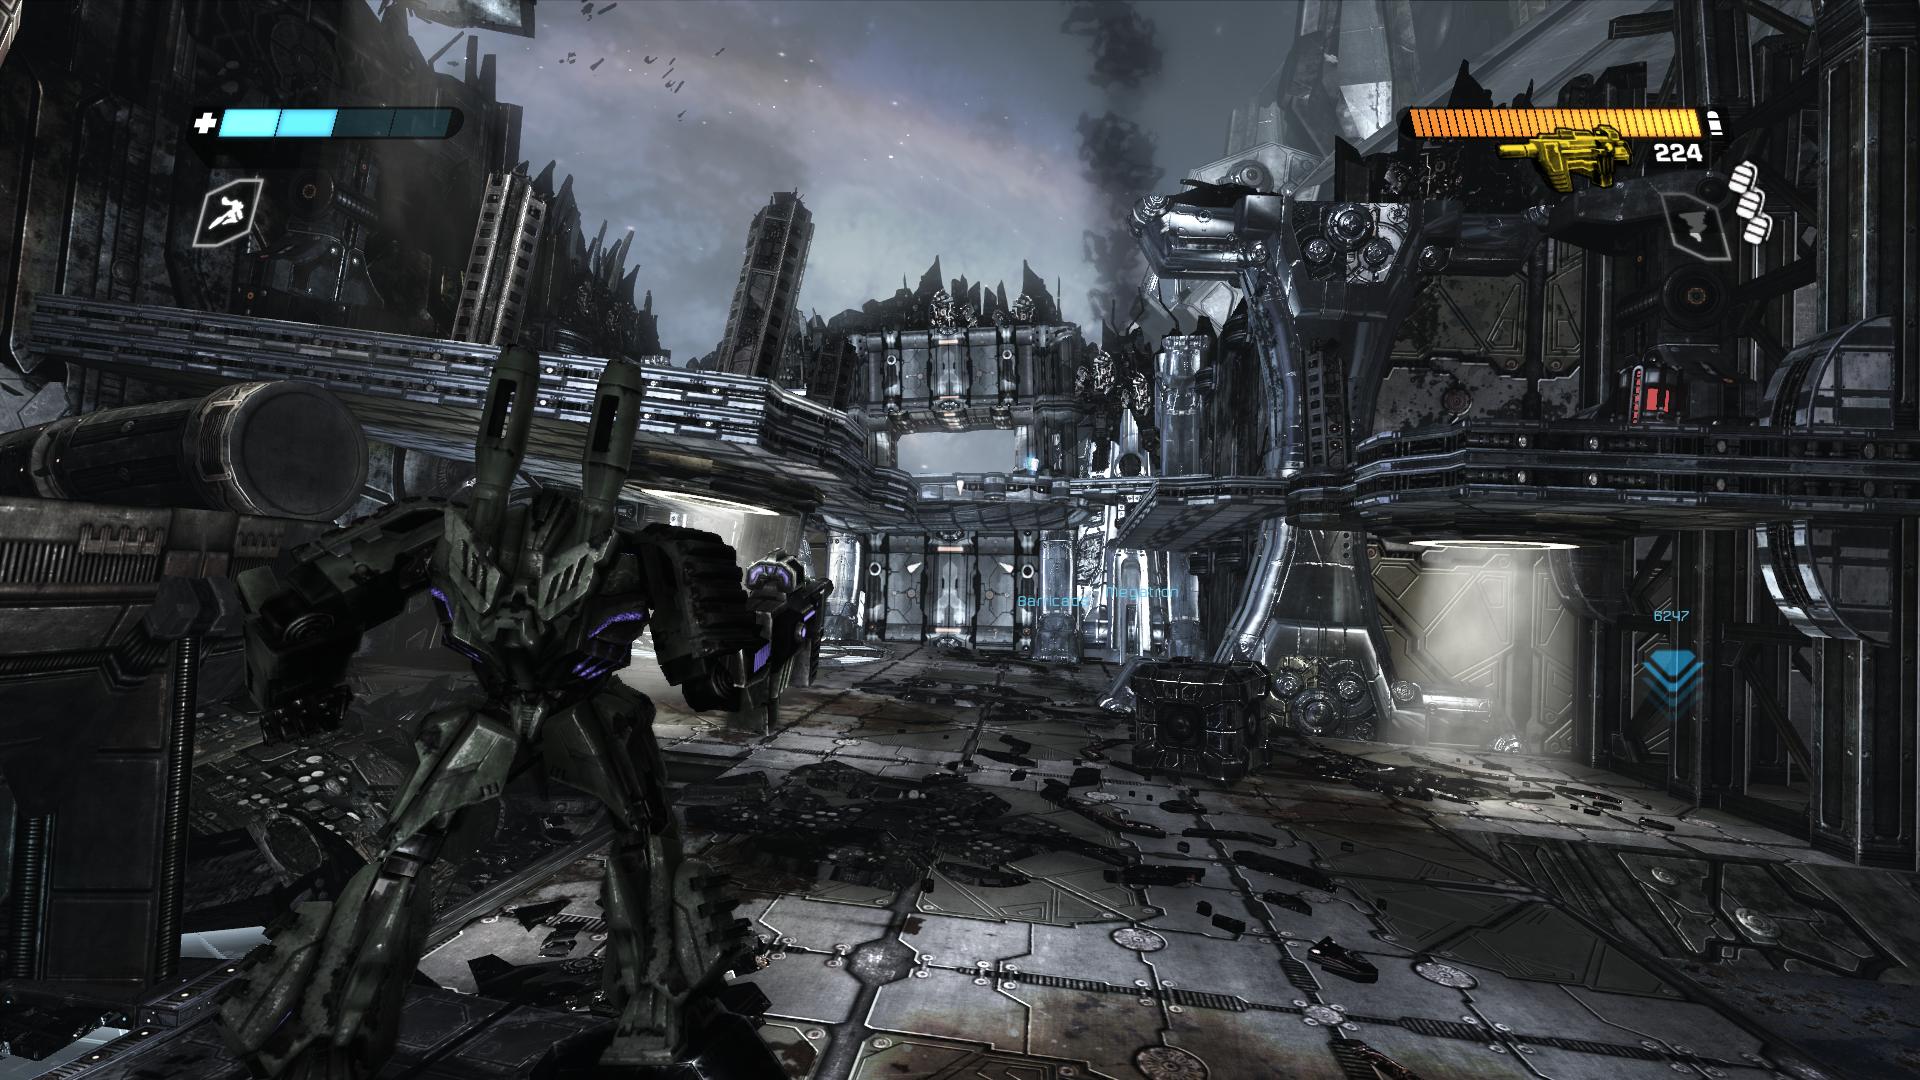 Transformers: War for Cybertron HD Wallpaper.